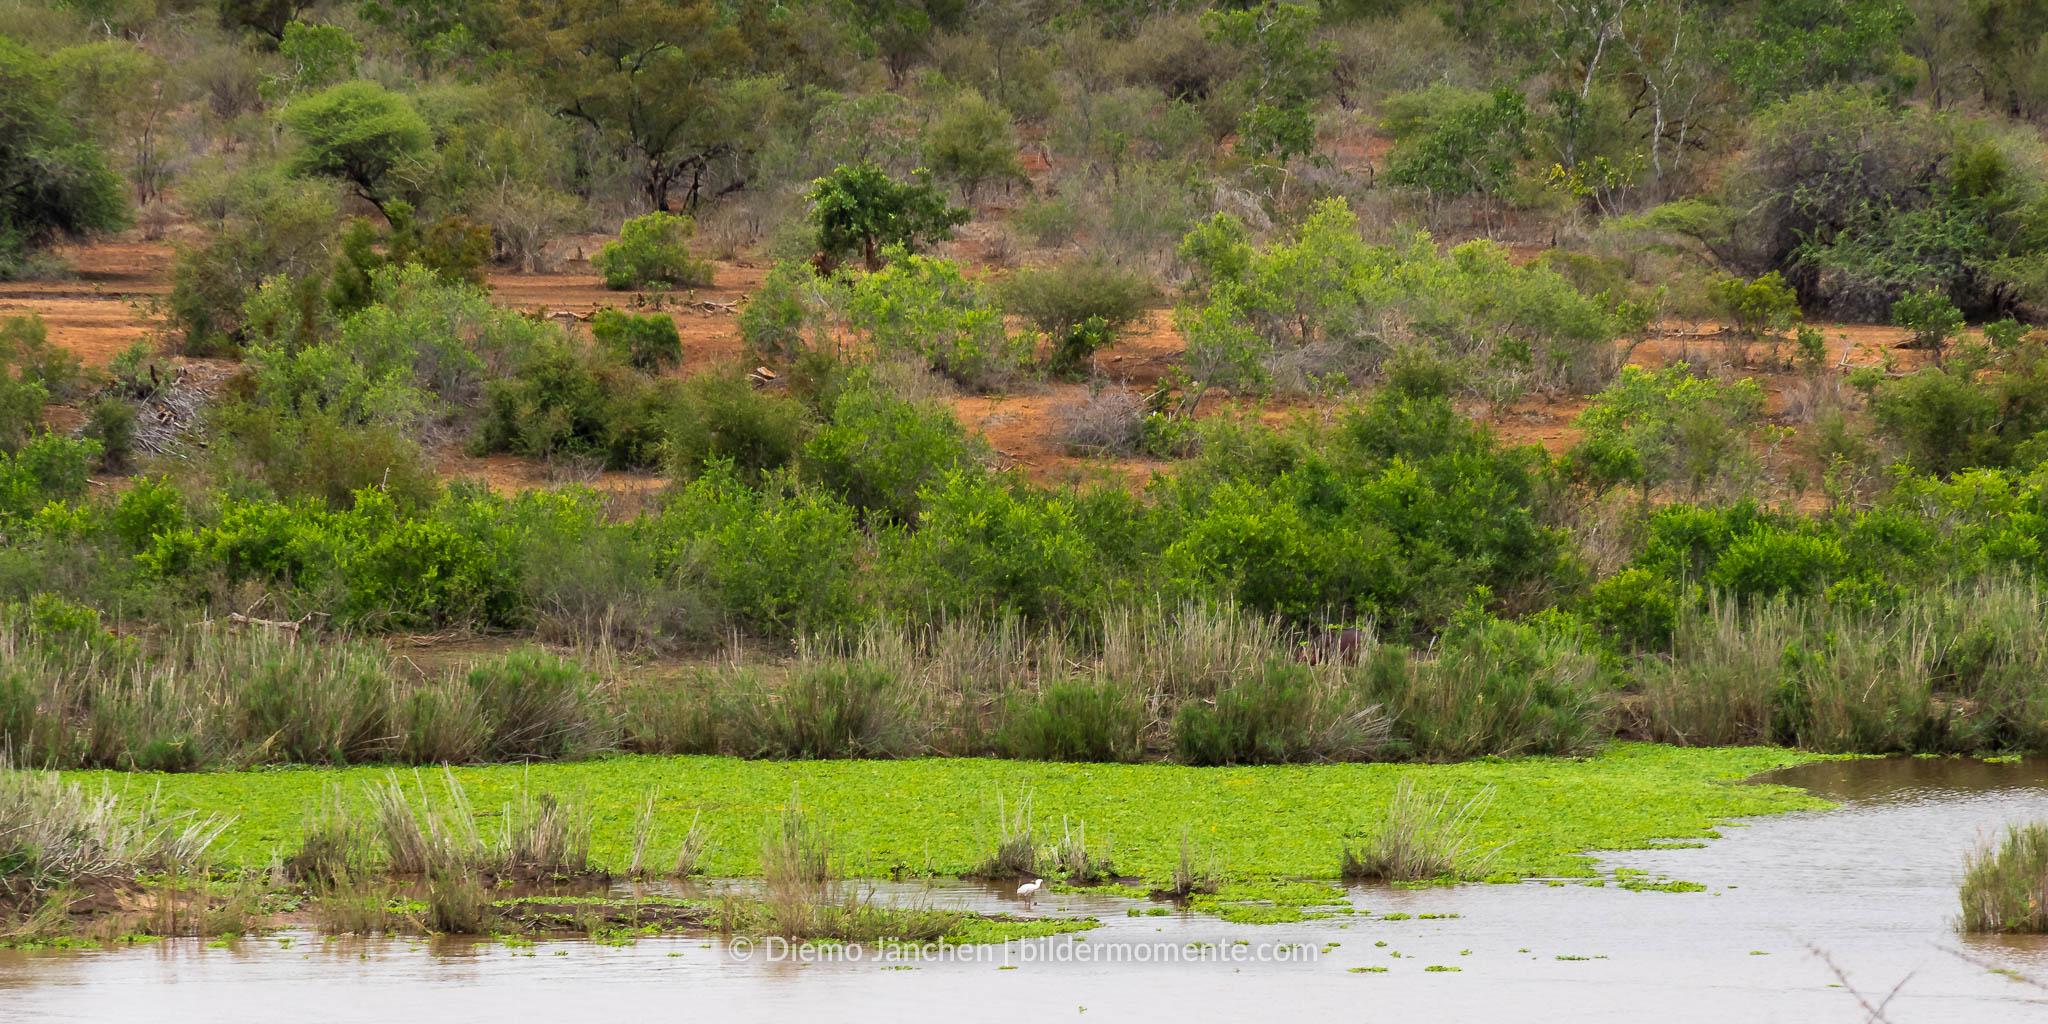 Ufer des Limpopo im Kruger National Park mit Störchen